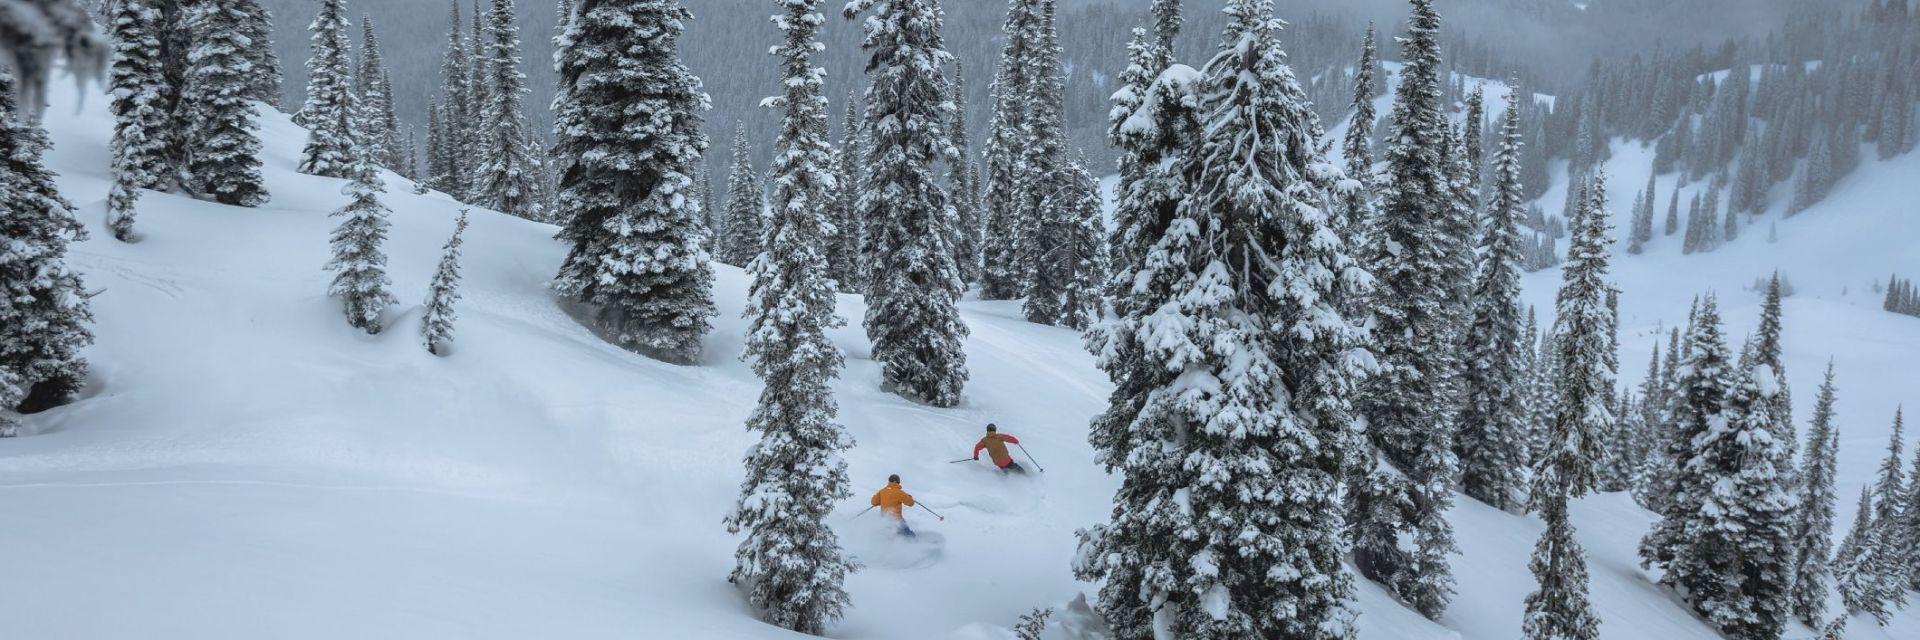 Skiers at Fernie Alpine Resort with town of Fernie in the background.